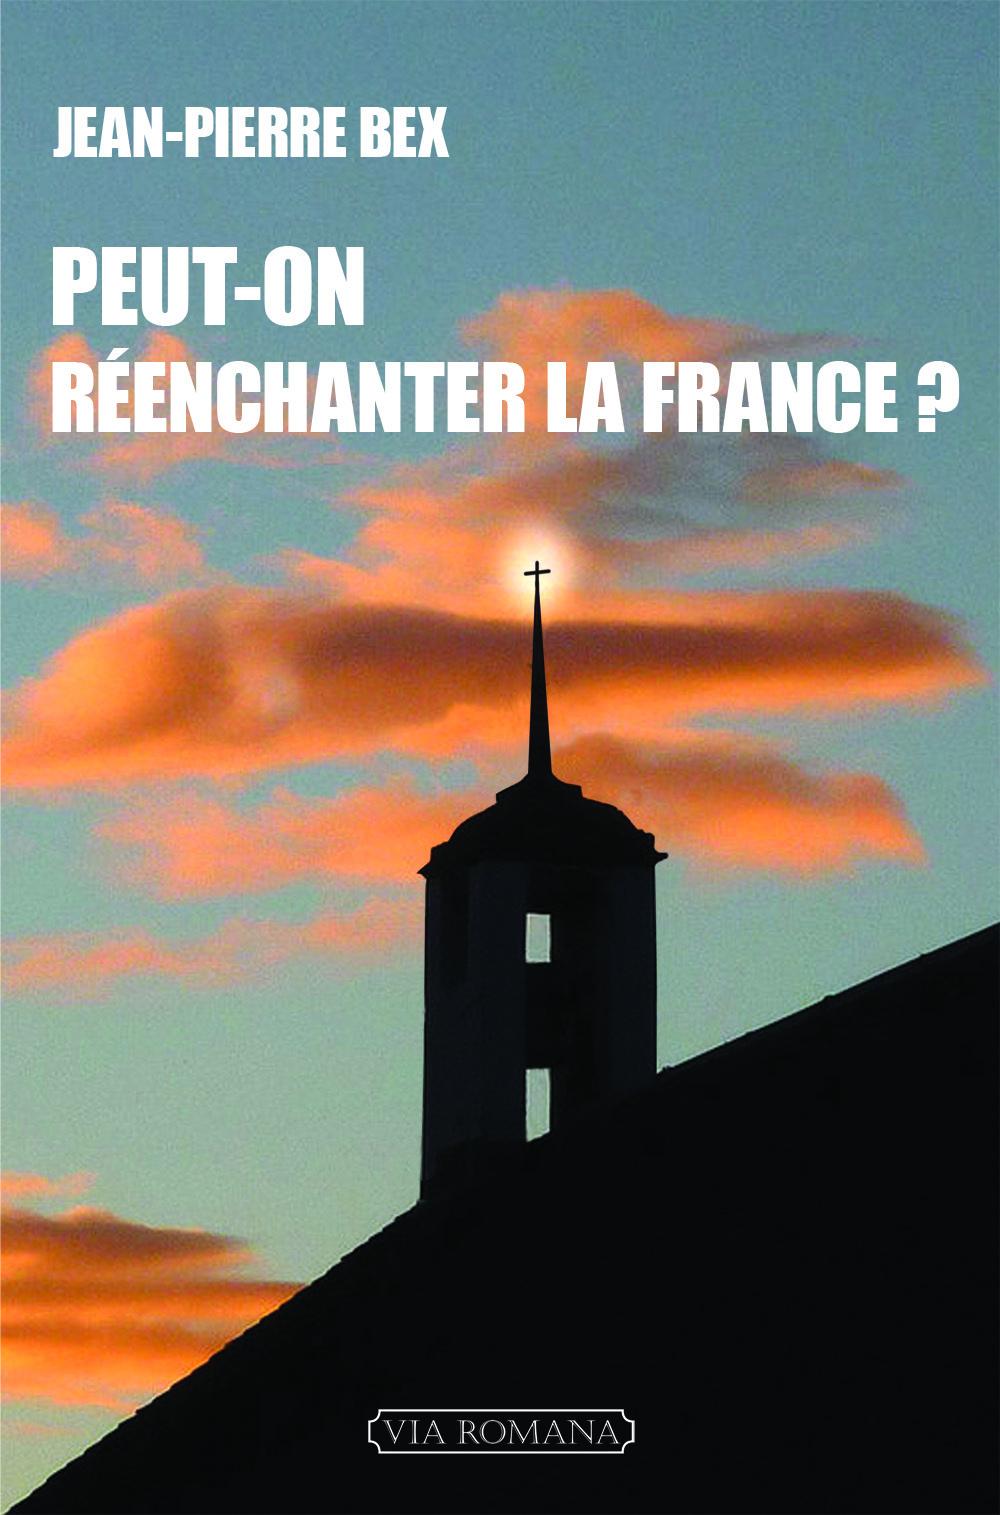 PEUT-ON REENCHANTER LA FRANCE?